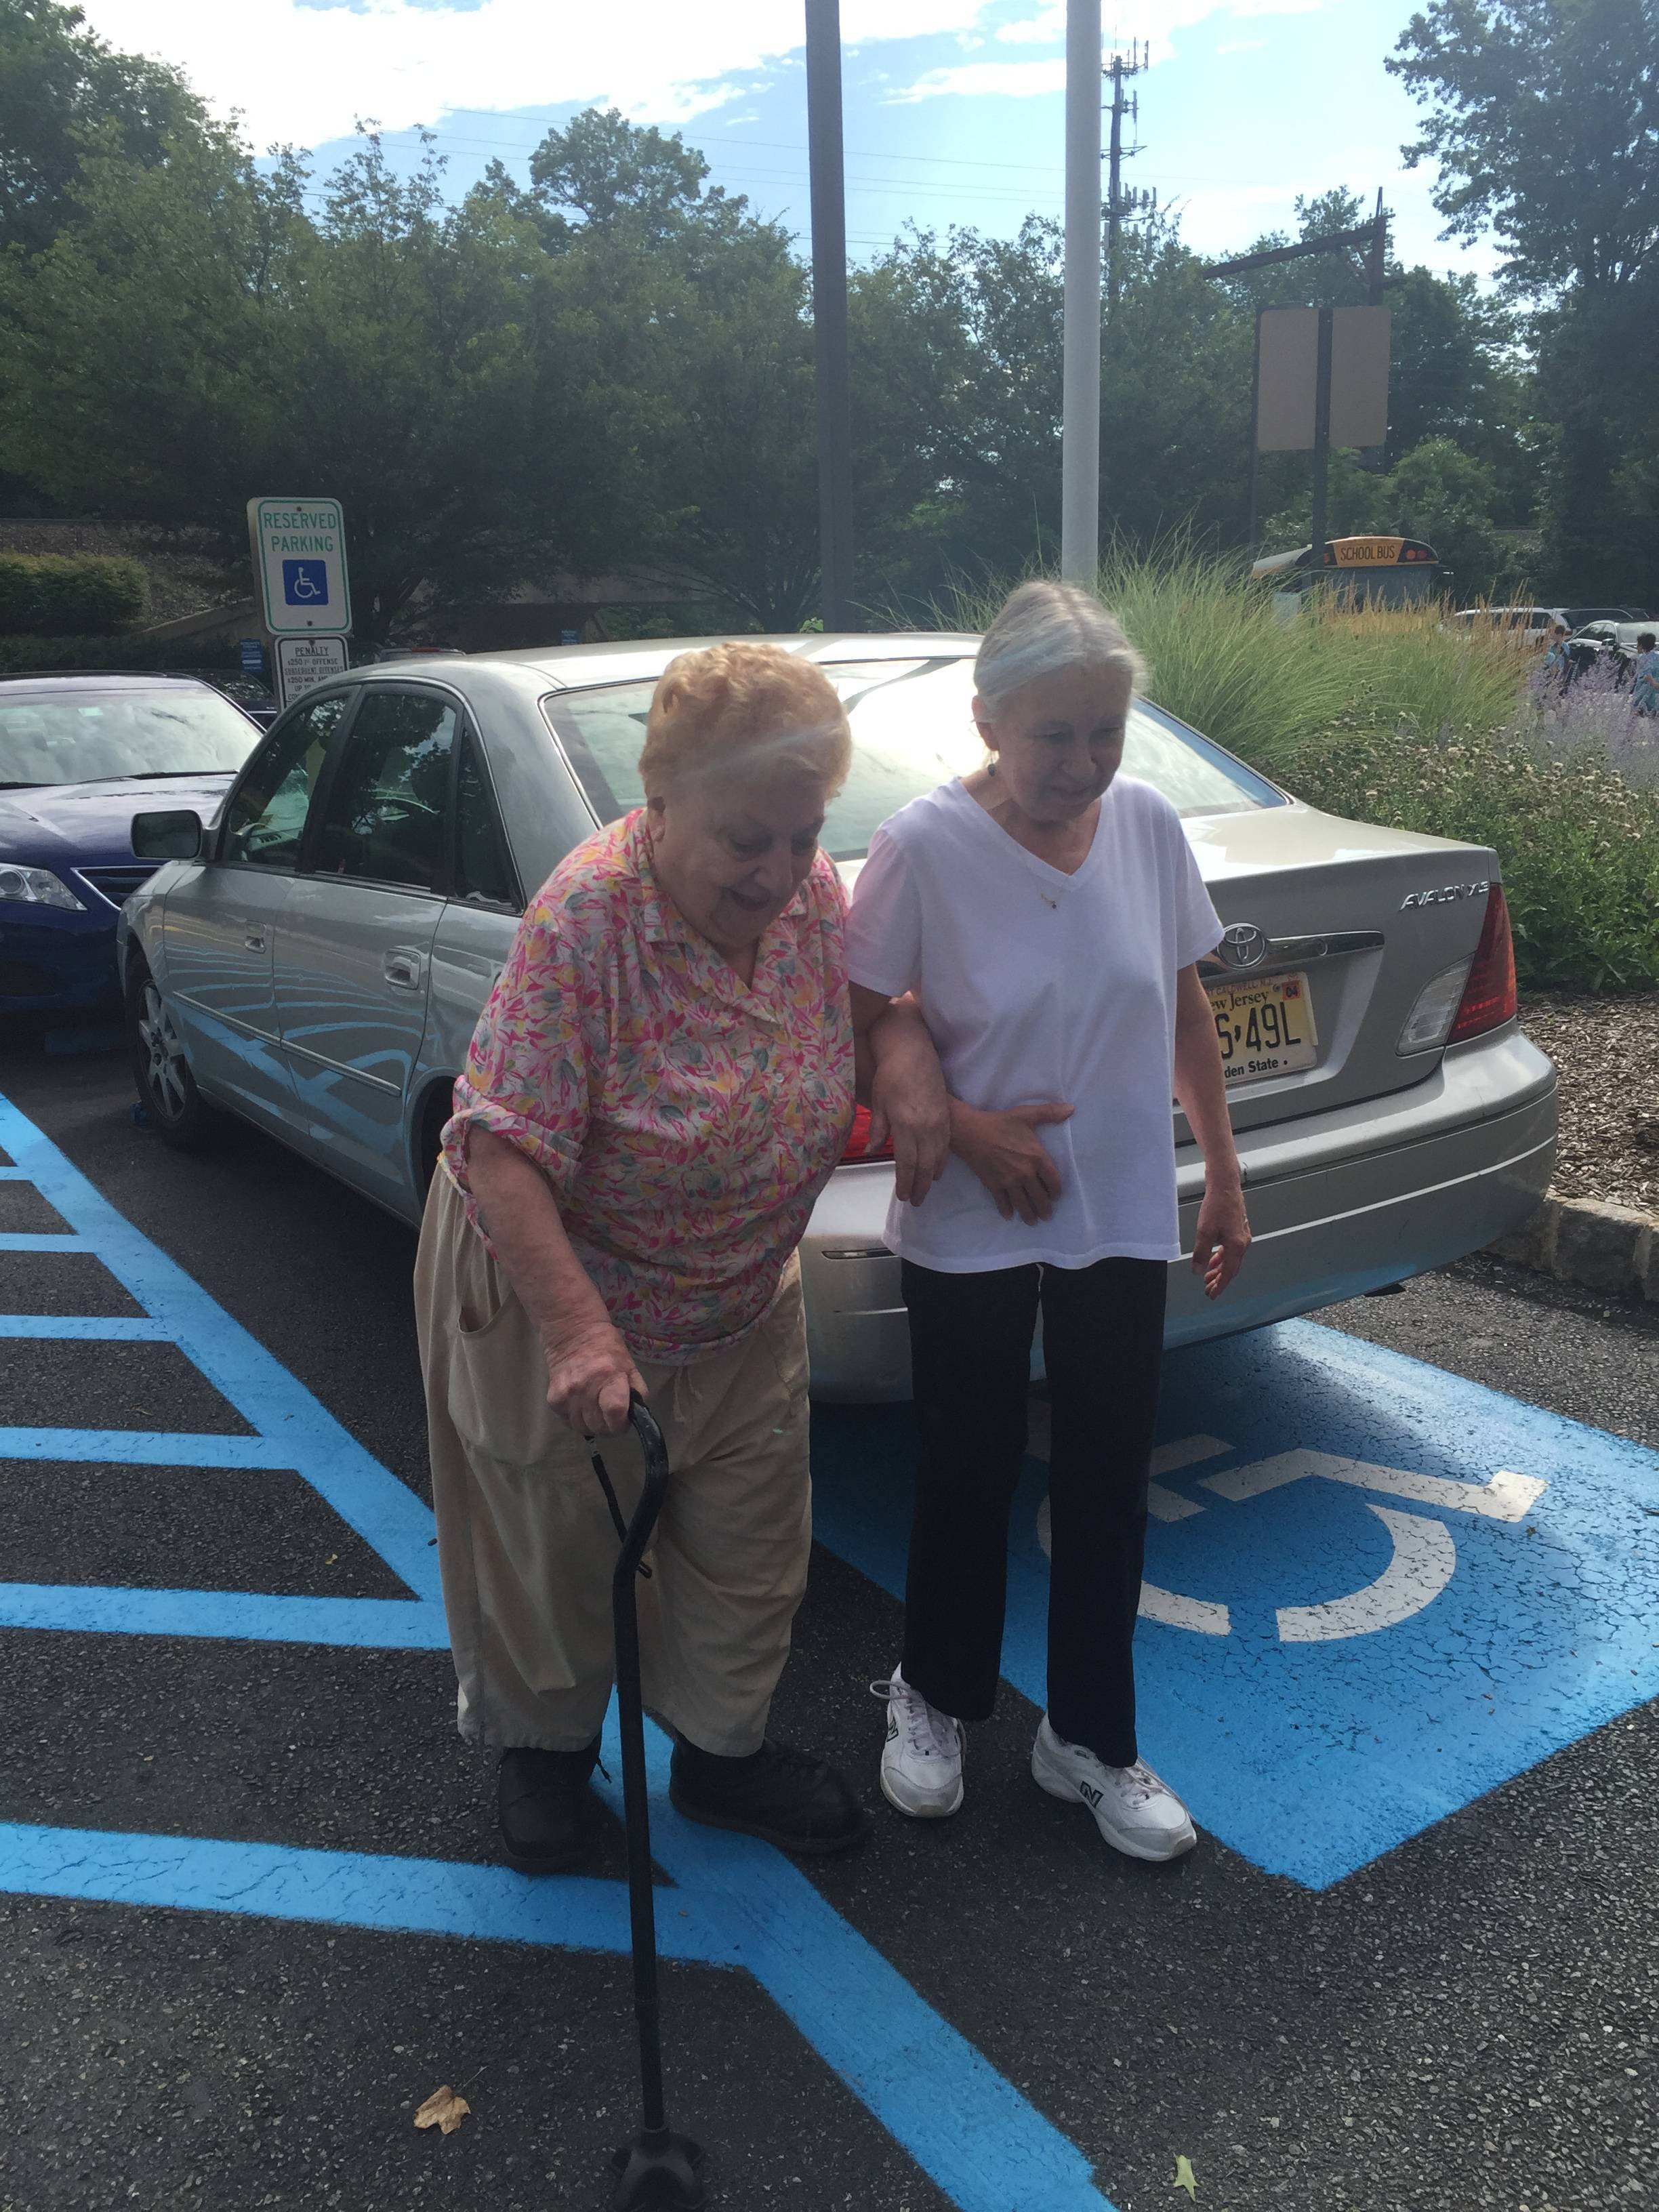 1c729c3f5763d770b102_Ann_and_Betty_walking_from_car.JPG